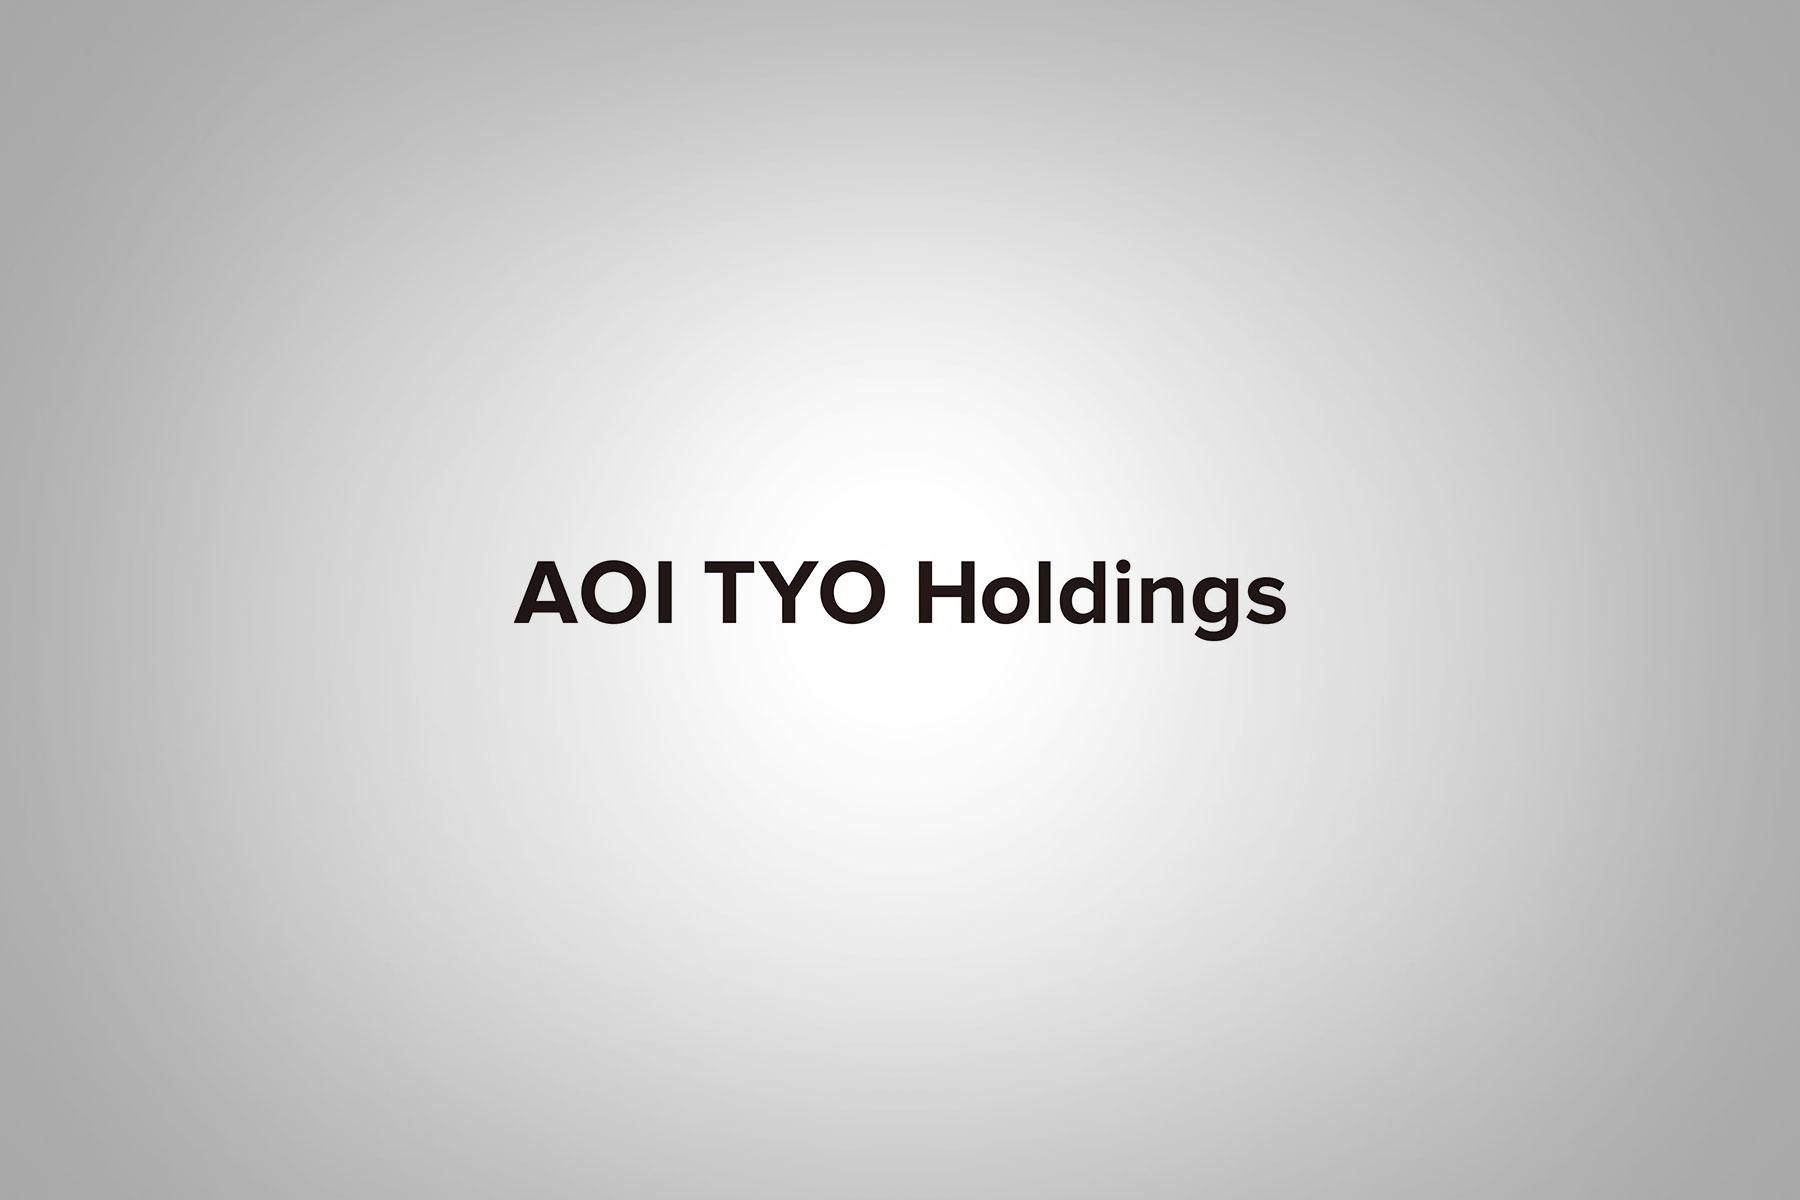 AOI TYO Holdings株式会社のトップ画像